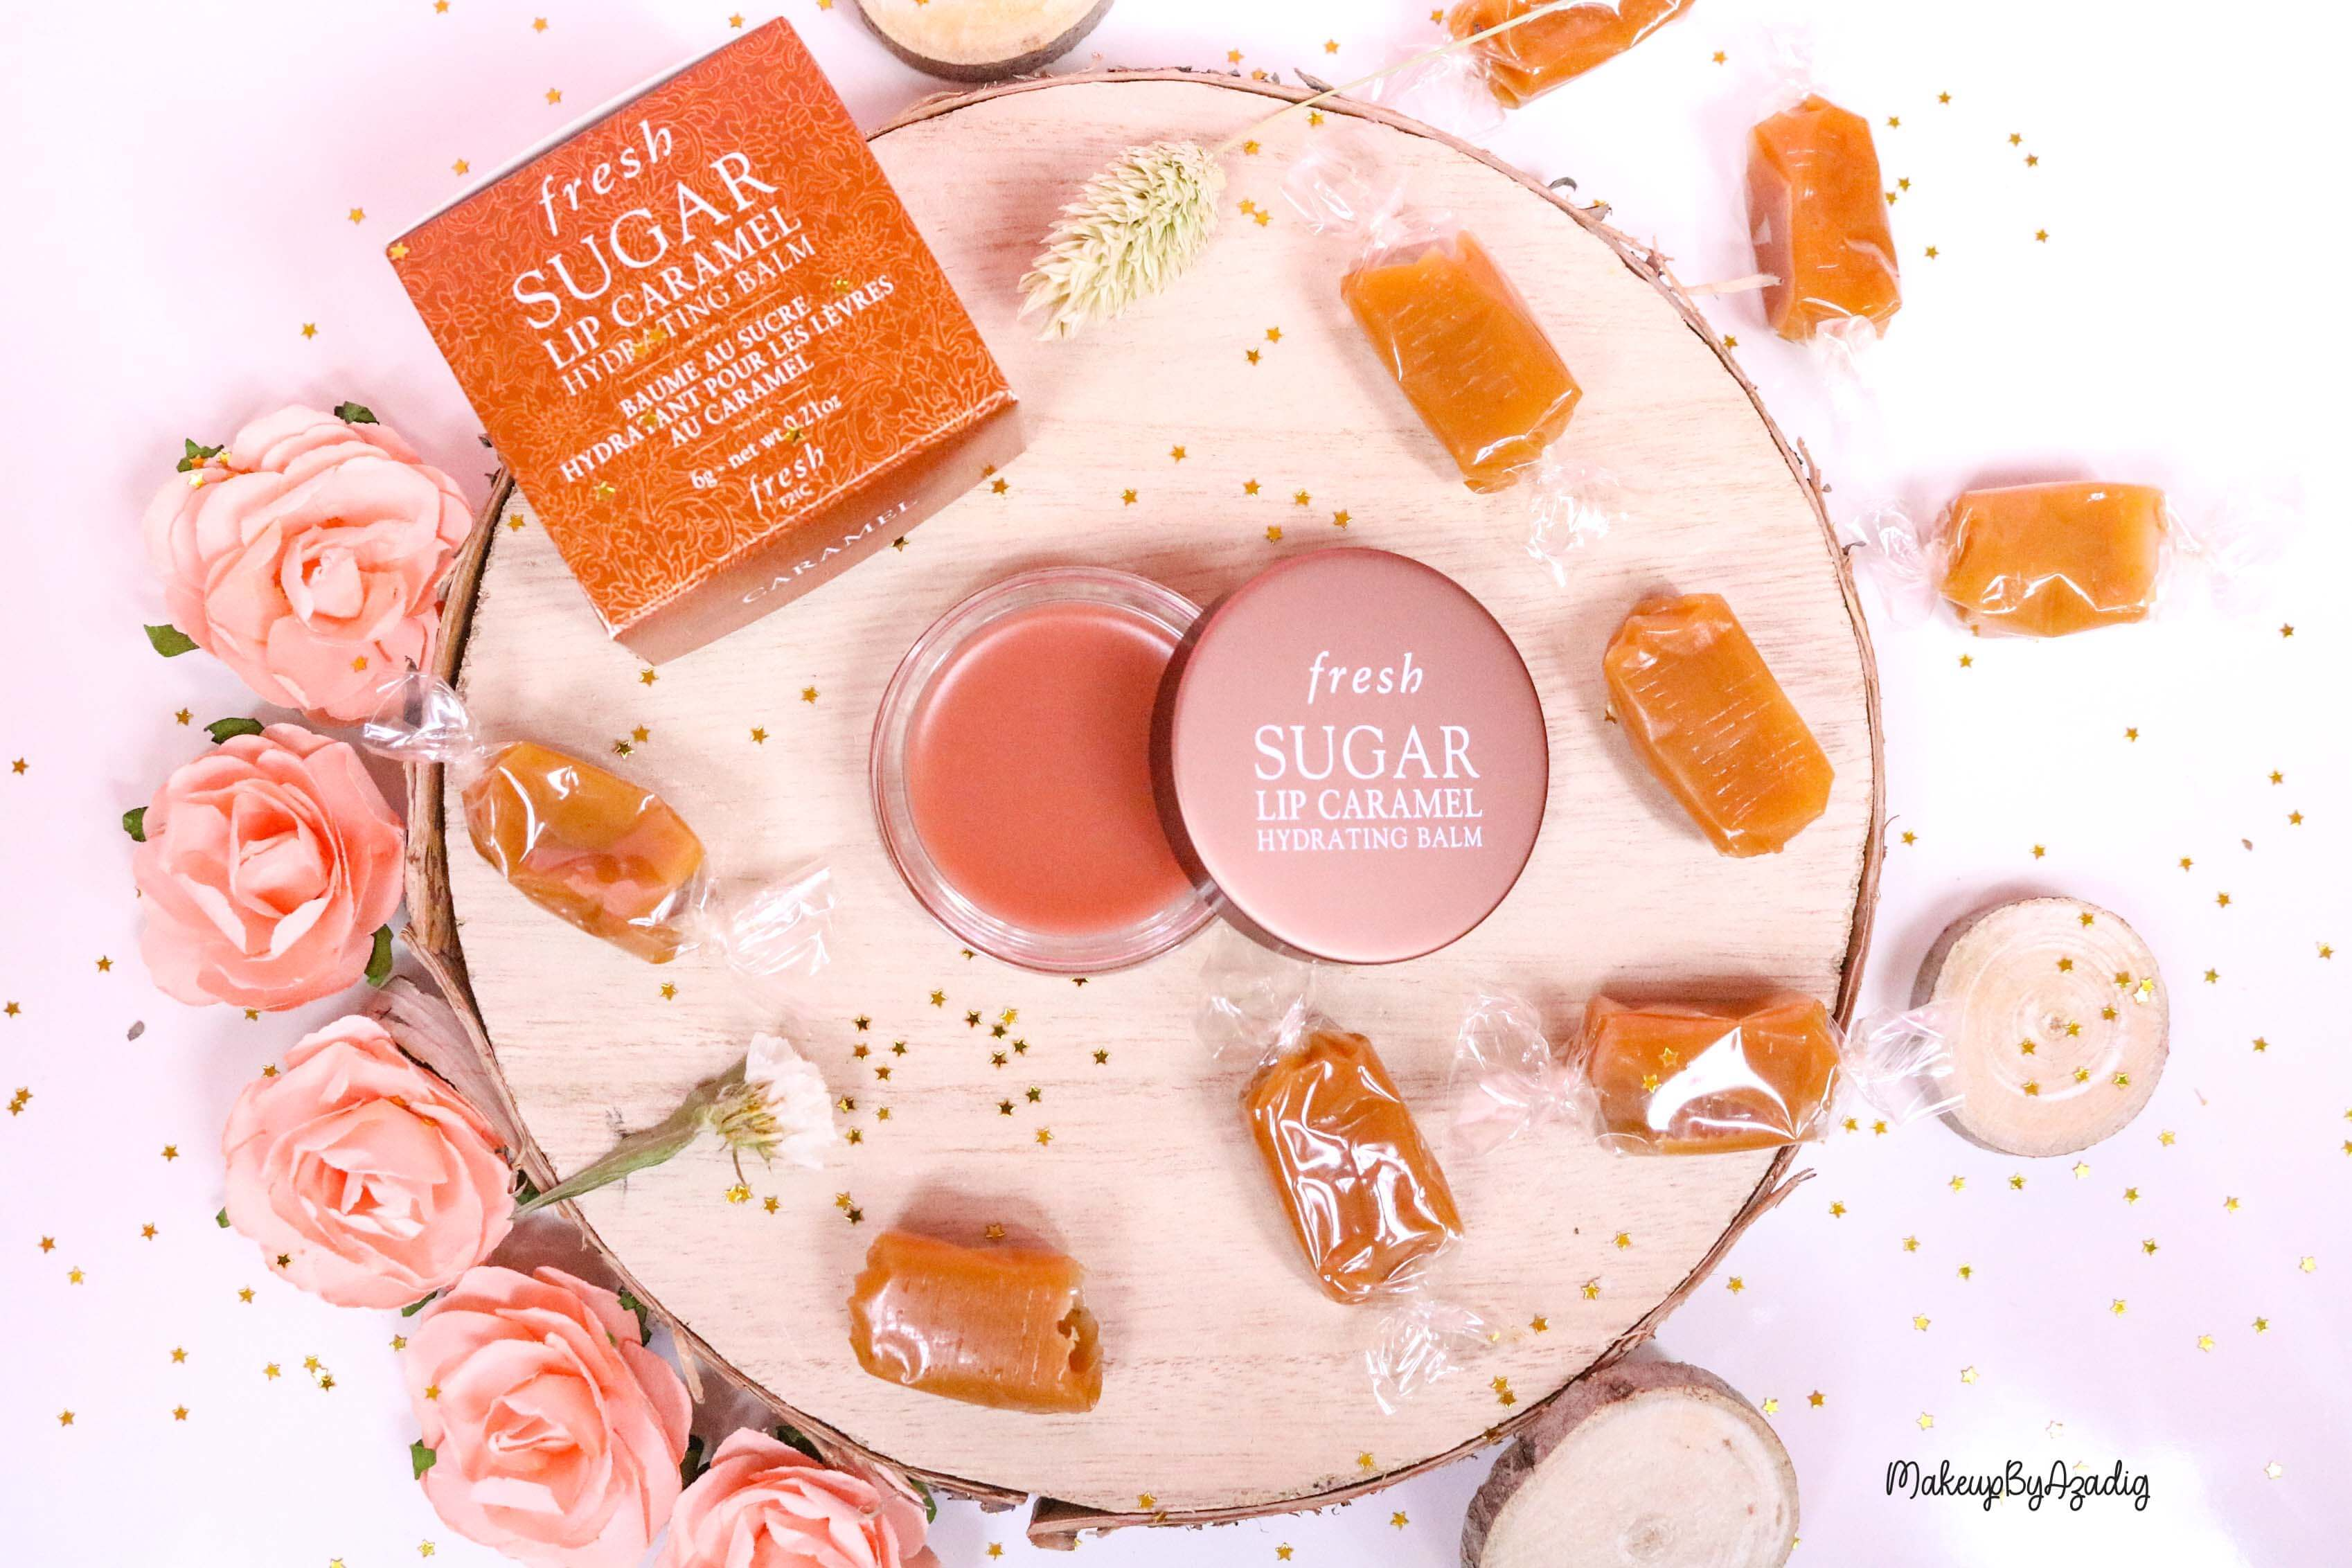 revue-baume-sucre-fresh-beauty-skincare-caramel-sugar-lip-caramel-sephora-makeupbyazadig-avis-prix-balm-france